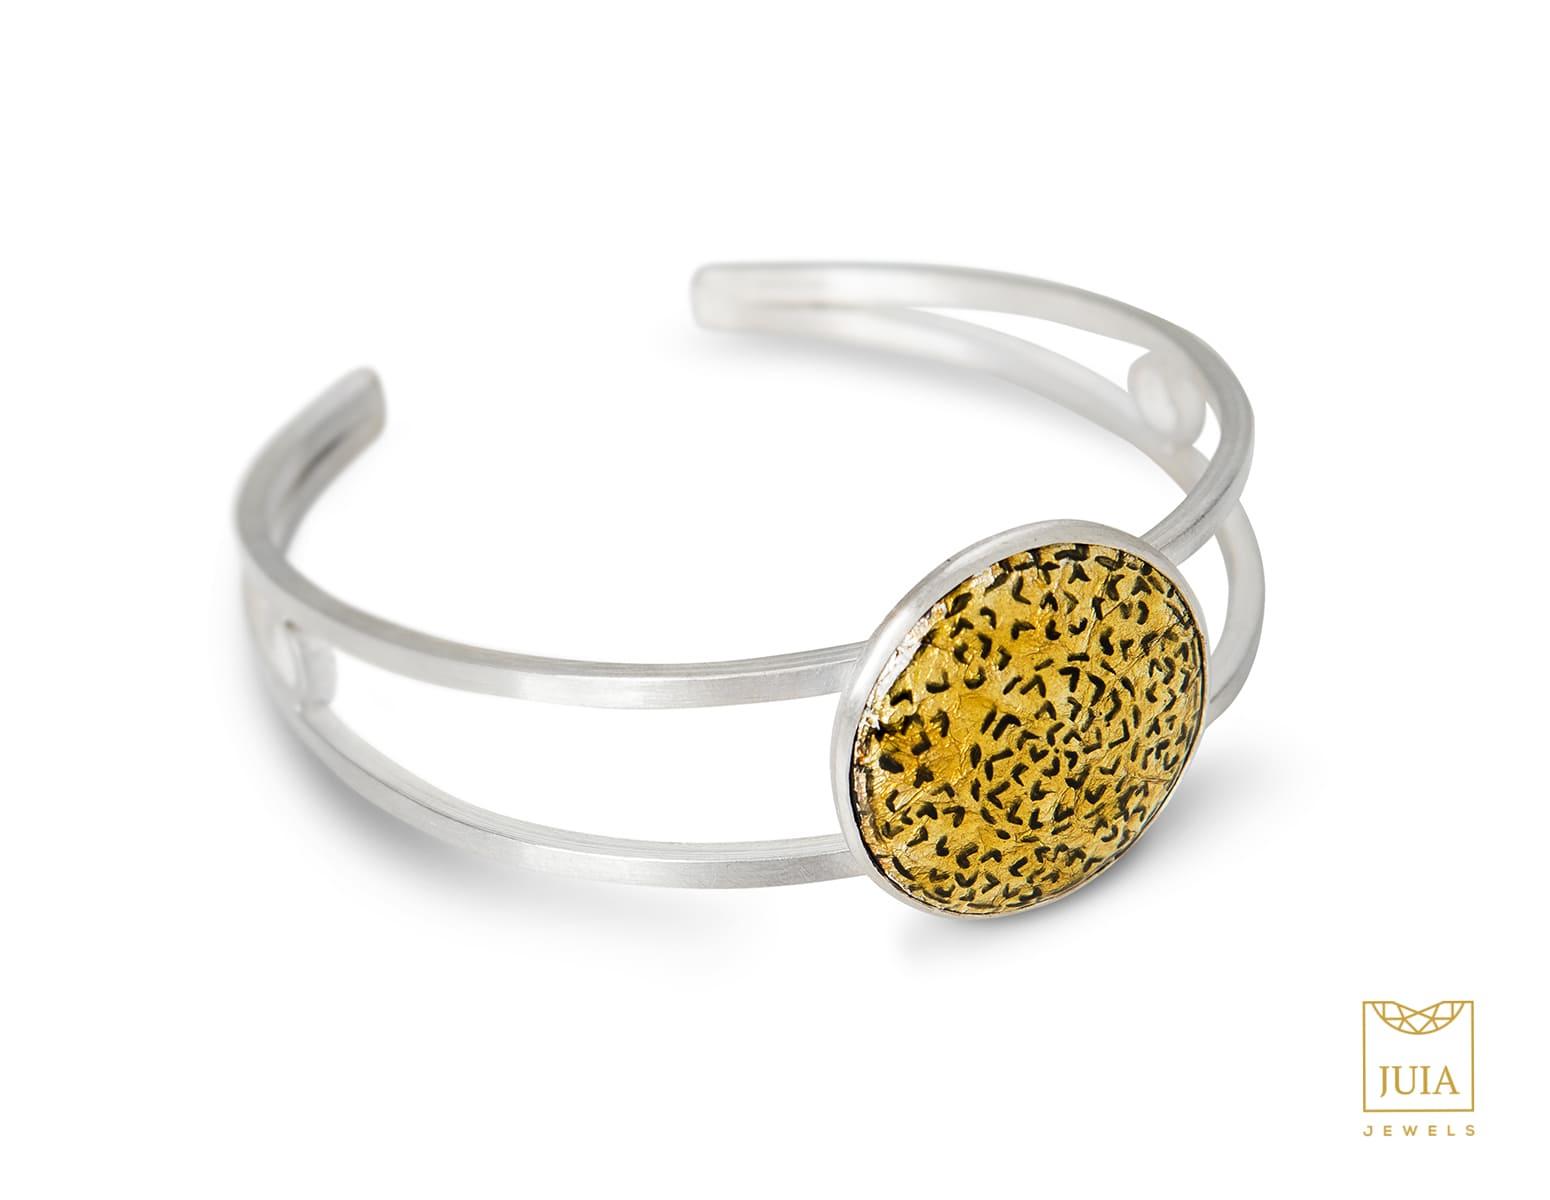 pulseras de plata para mujer, joyas artesanales, joyas para regalar, juia jewels barcelona, joyasmarket